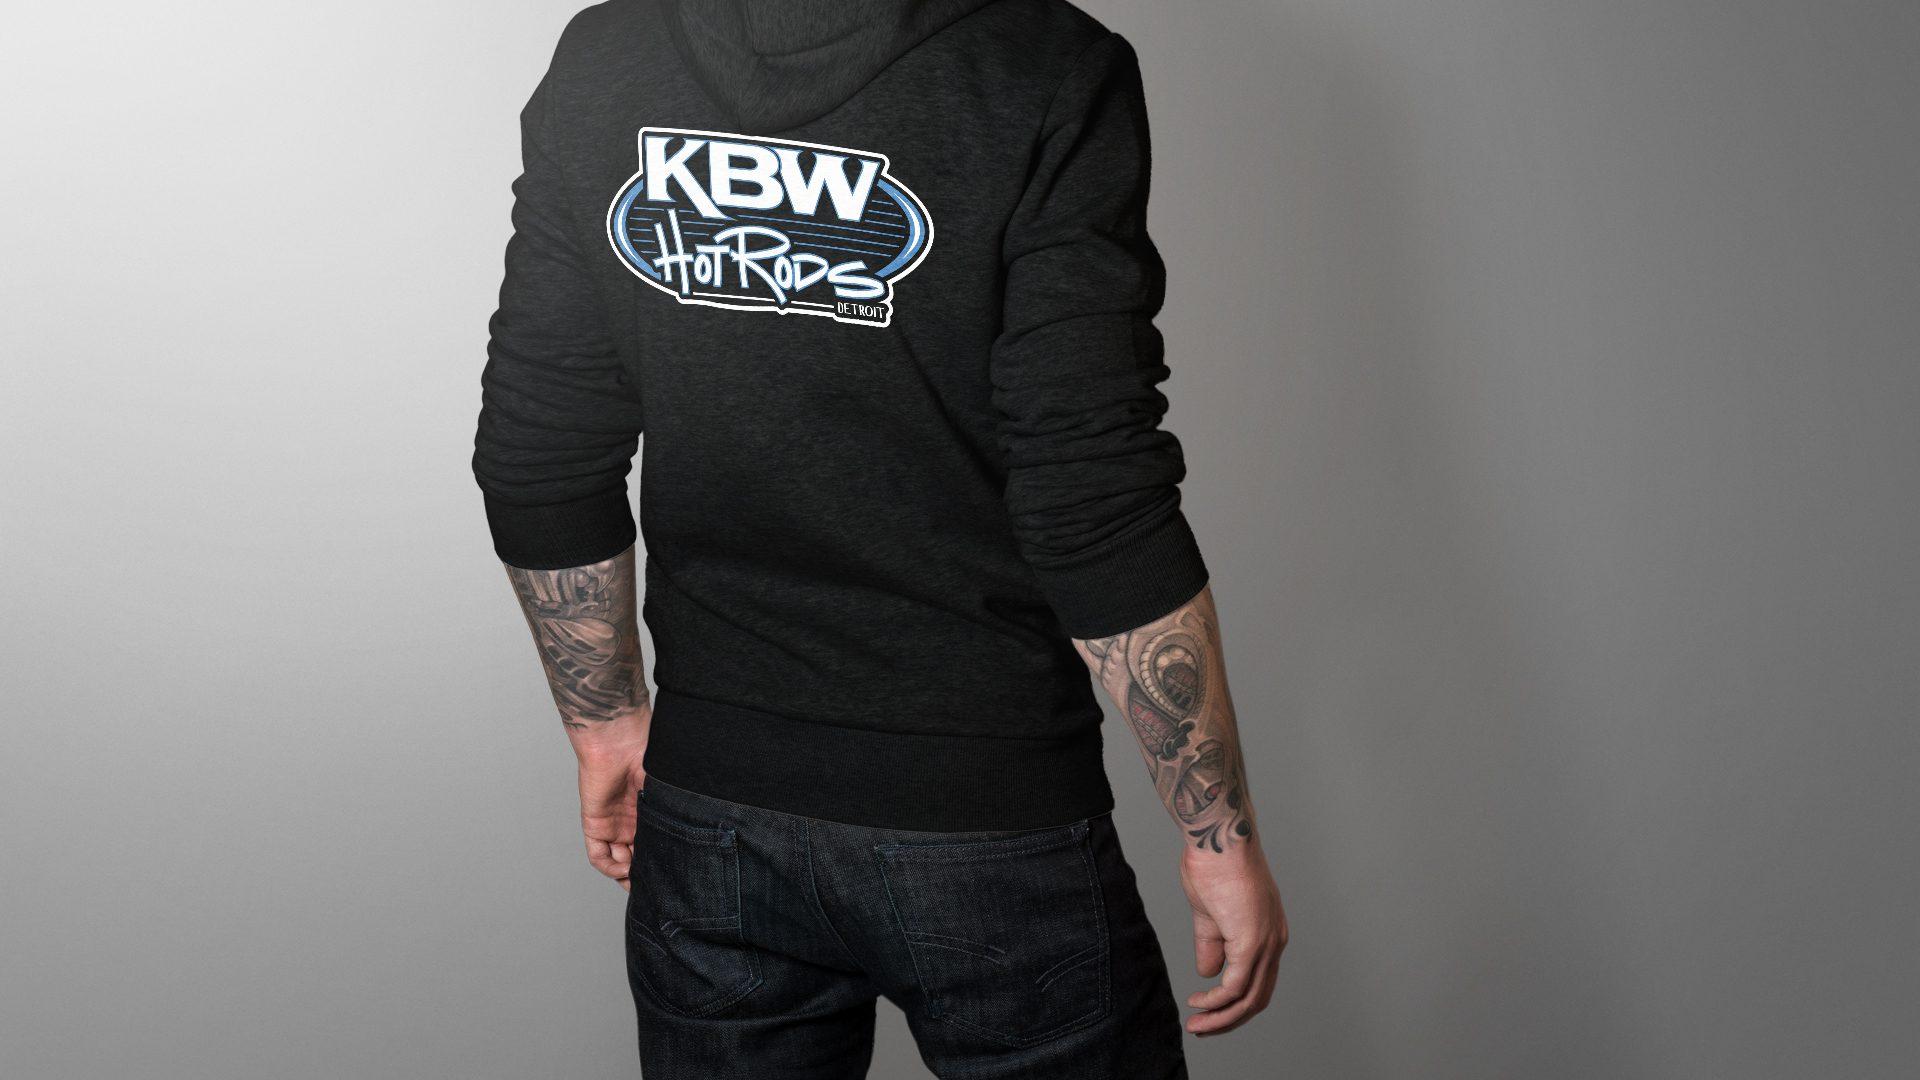 Kreative Body Werks - KBW Silkscreen Hoodies (2)